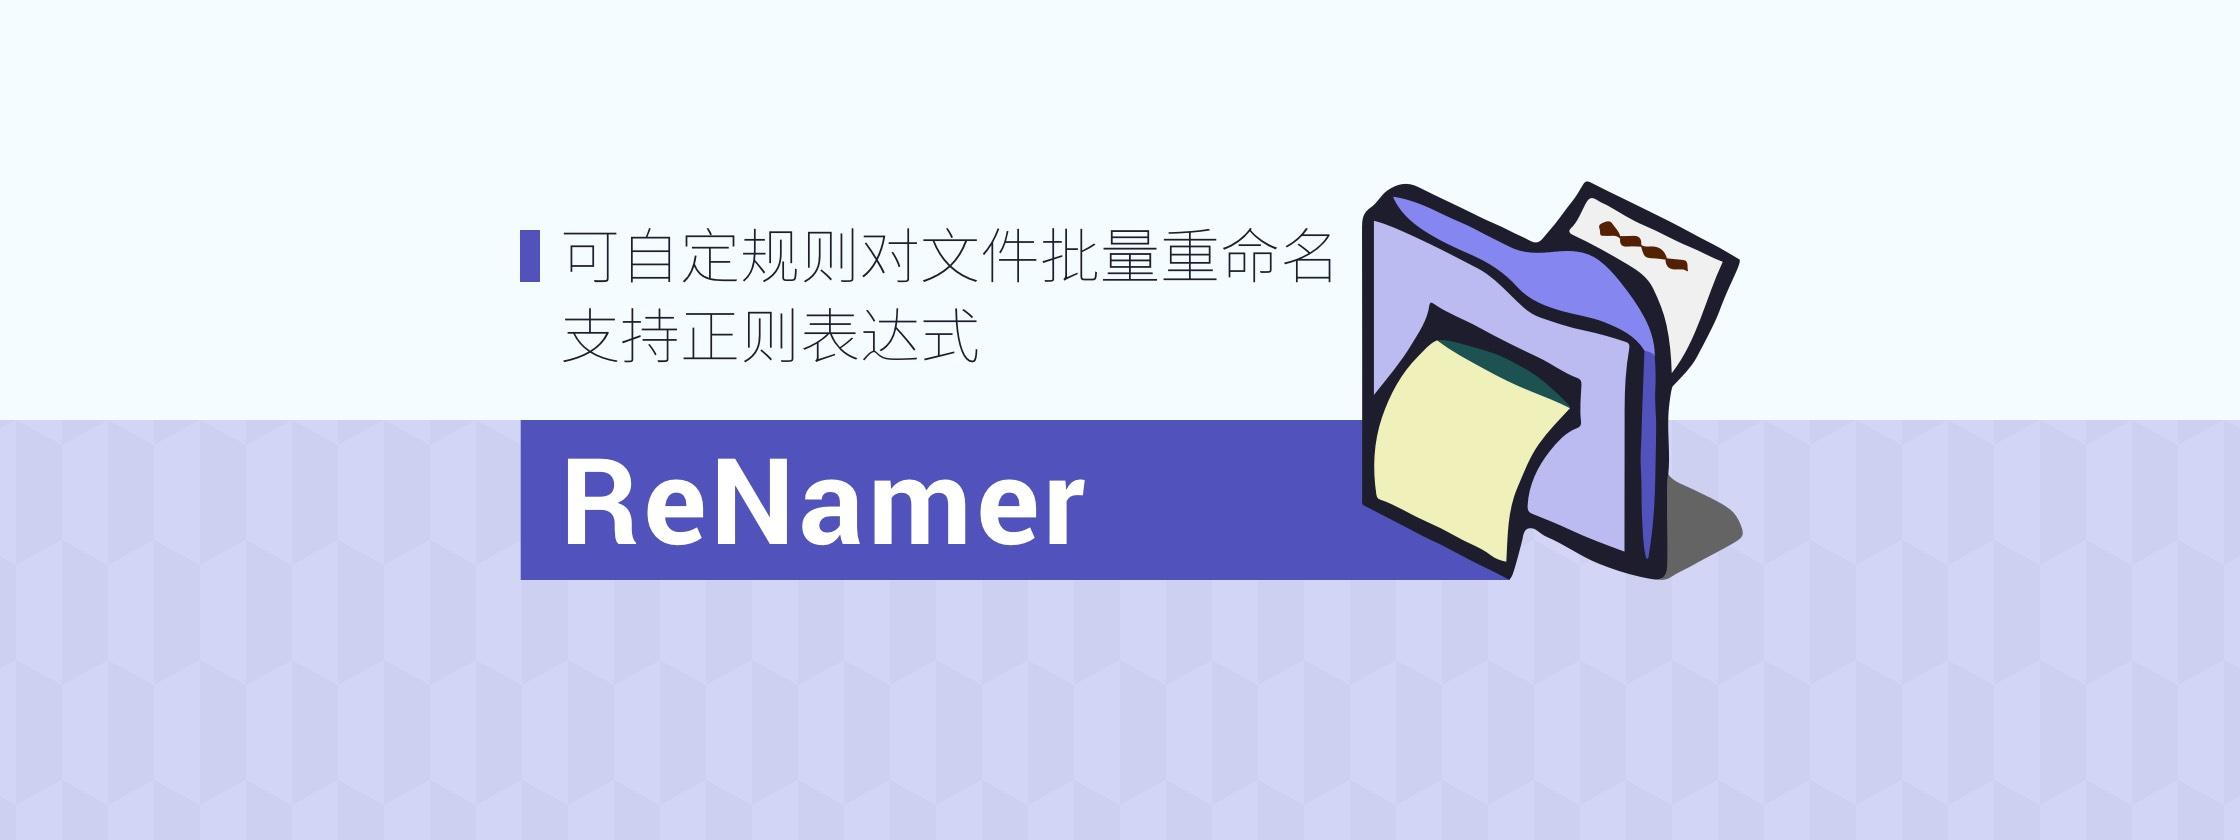 ReNamer:灵活的文件重命名工具